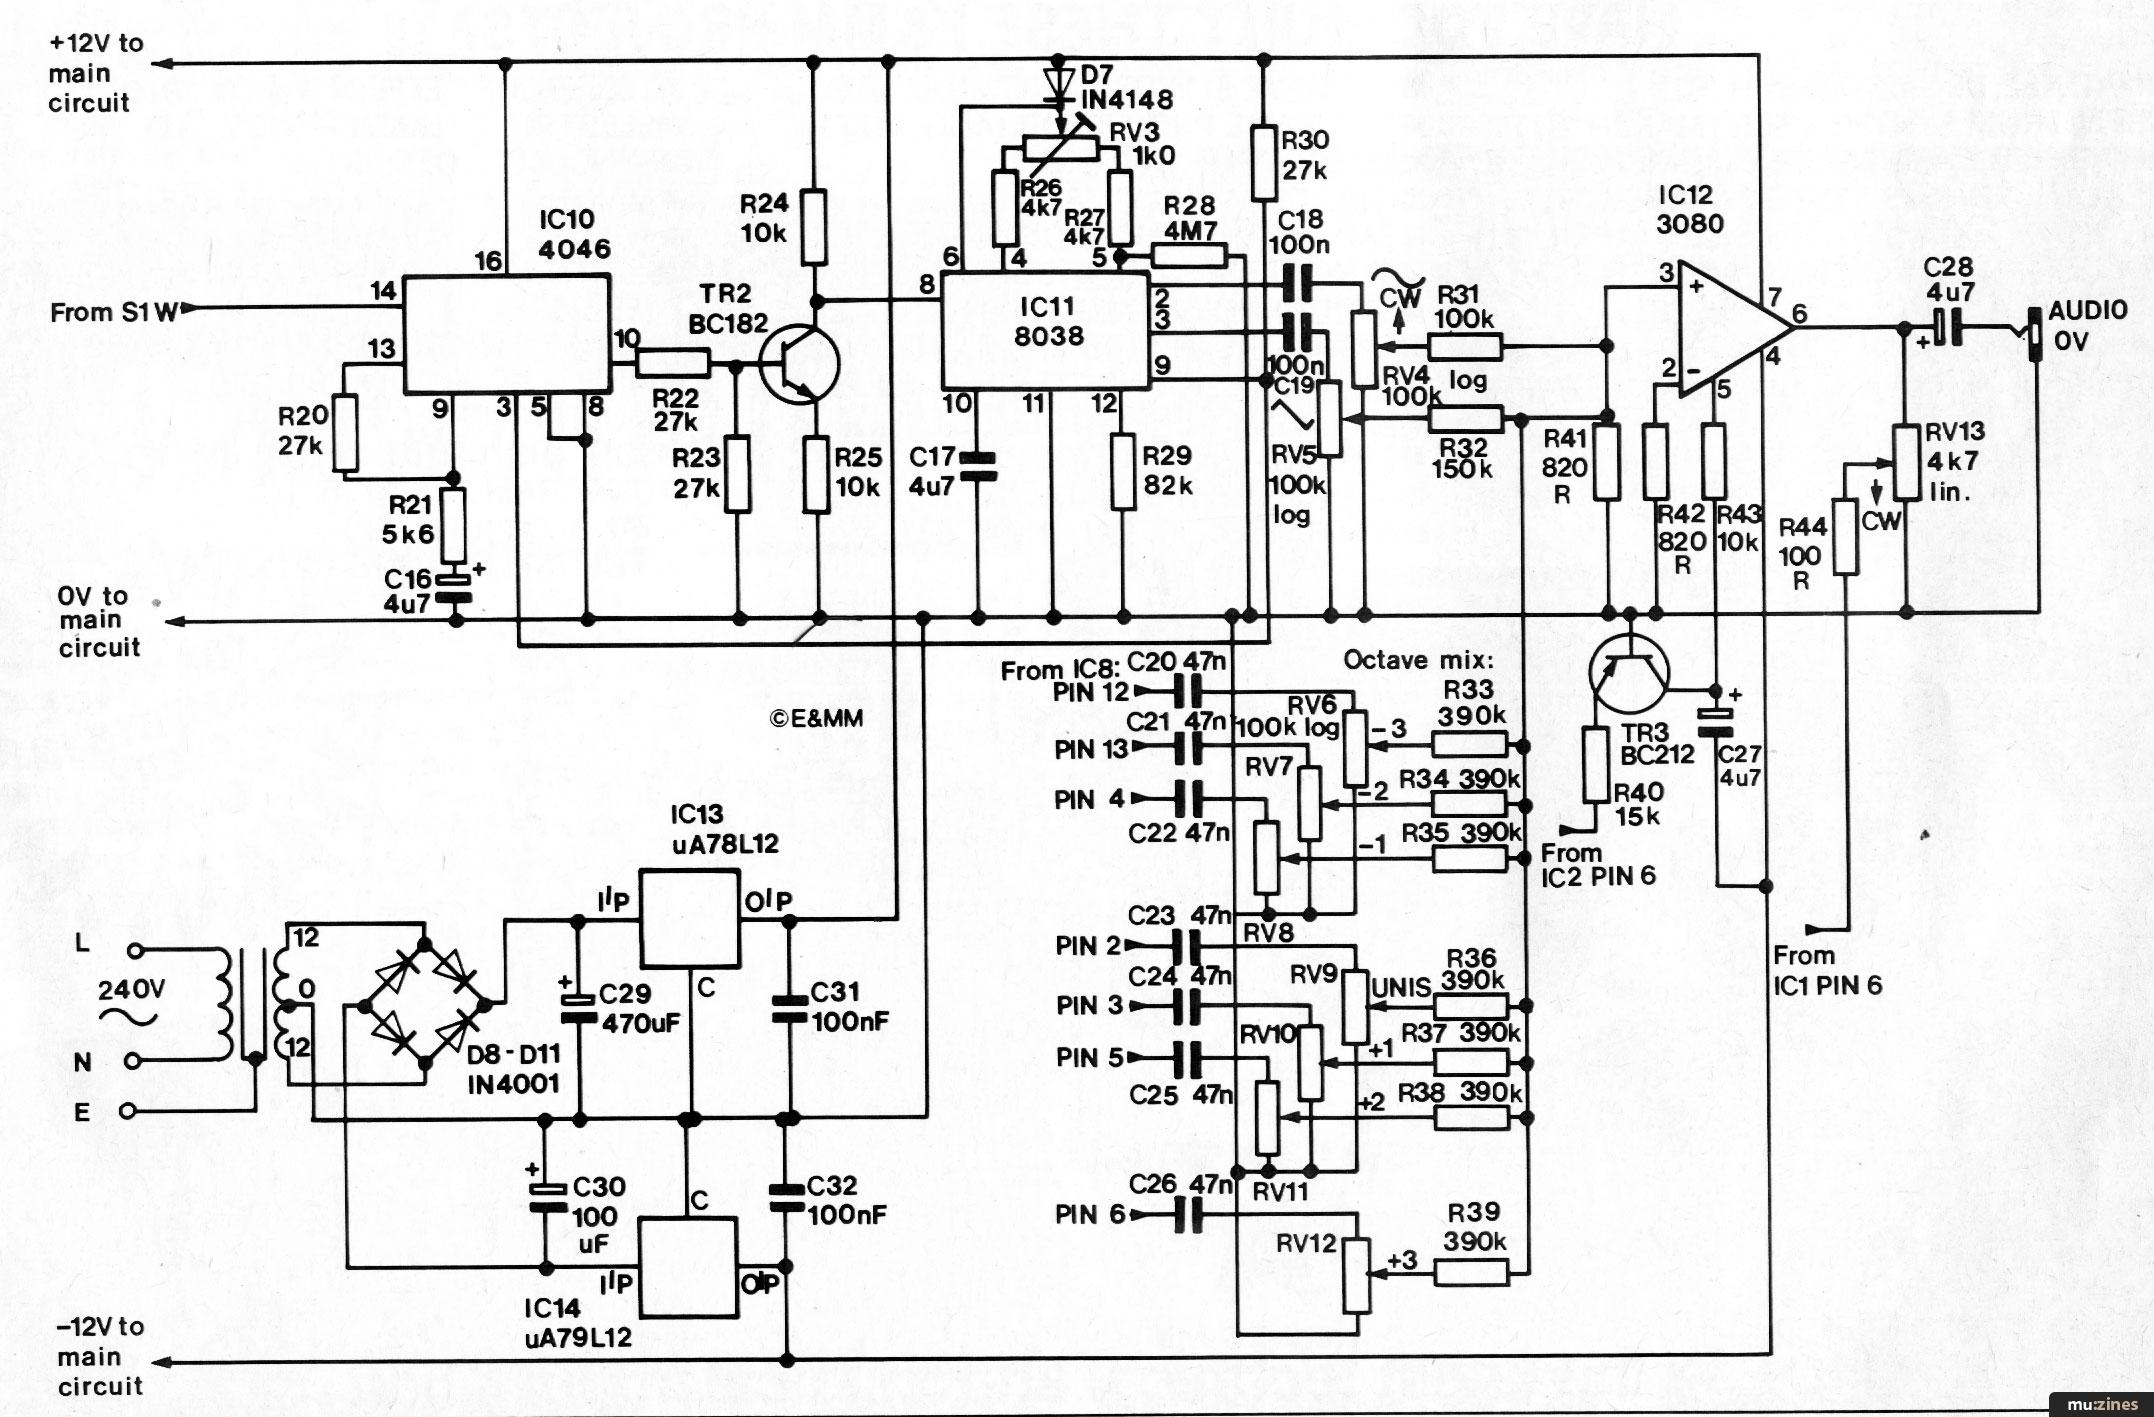 Circuit Maker Emm Jul 82